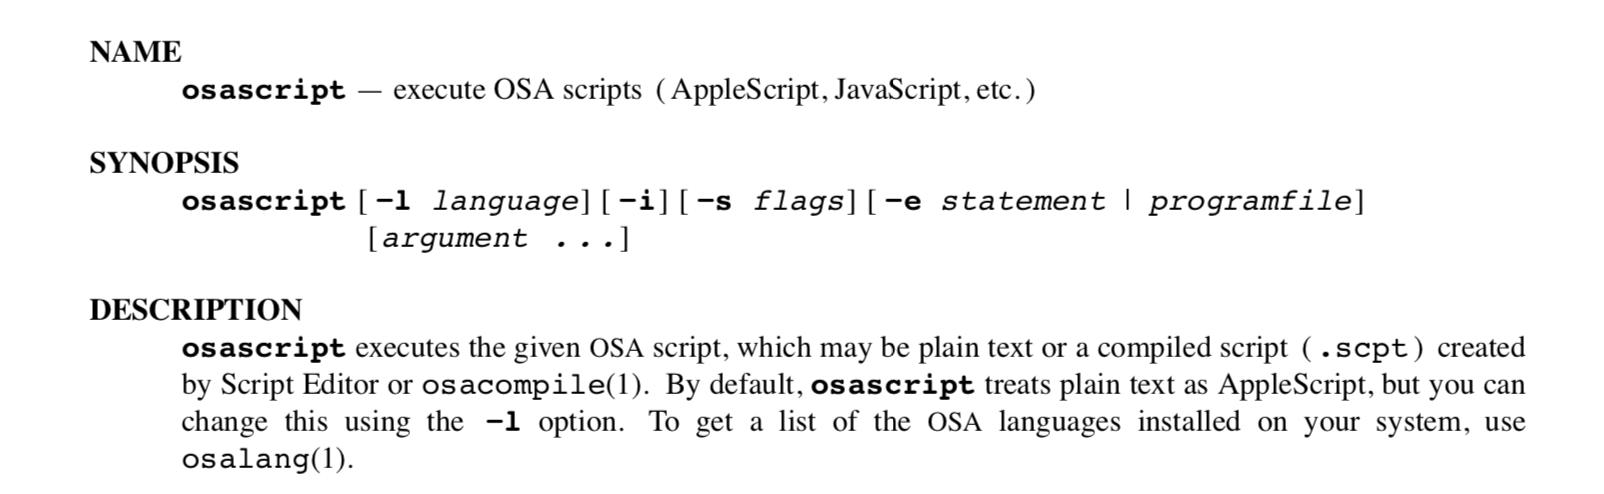 Scripting Tinderbox in v8 - External Scripting of Tinderbox